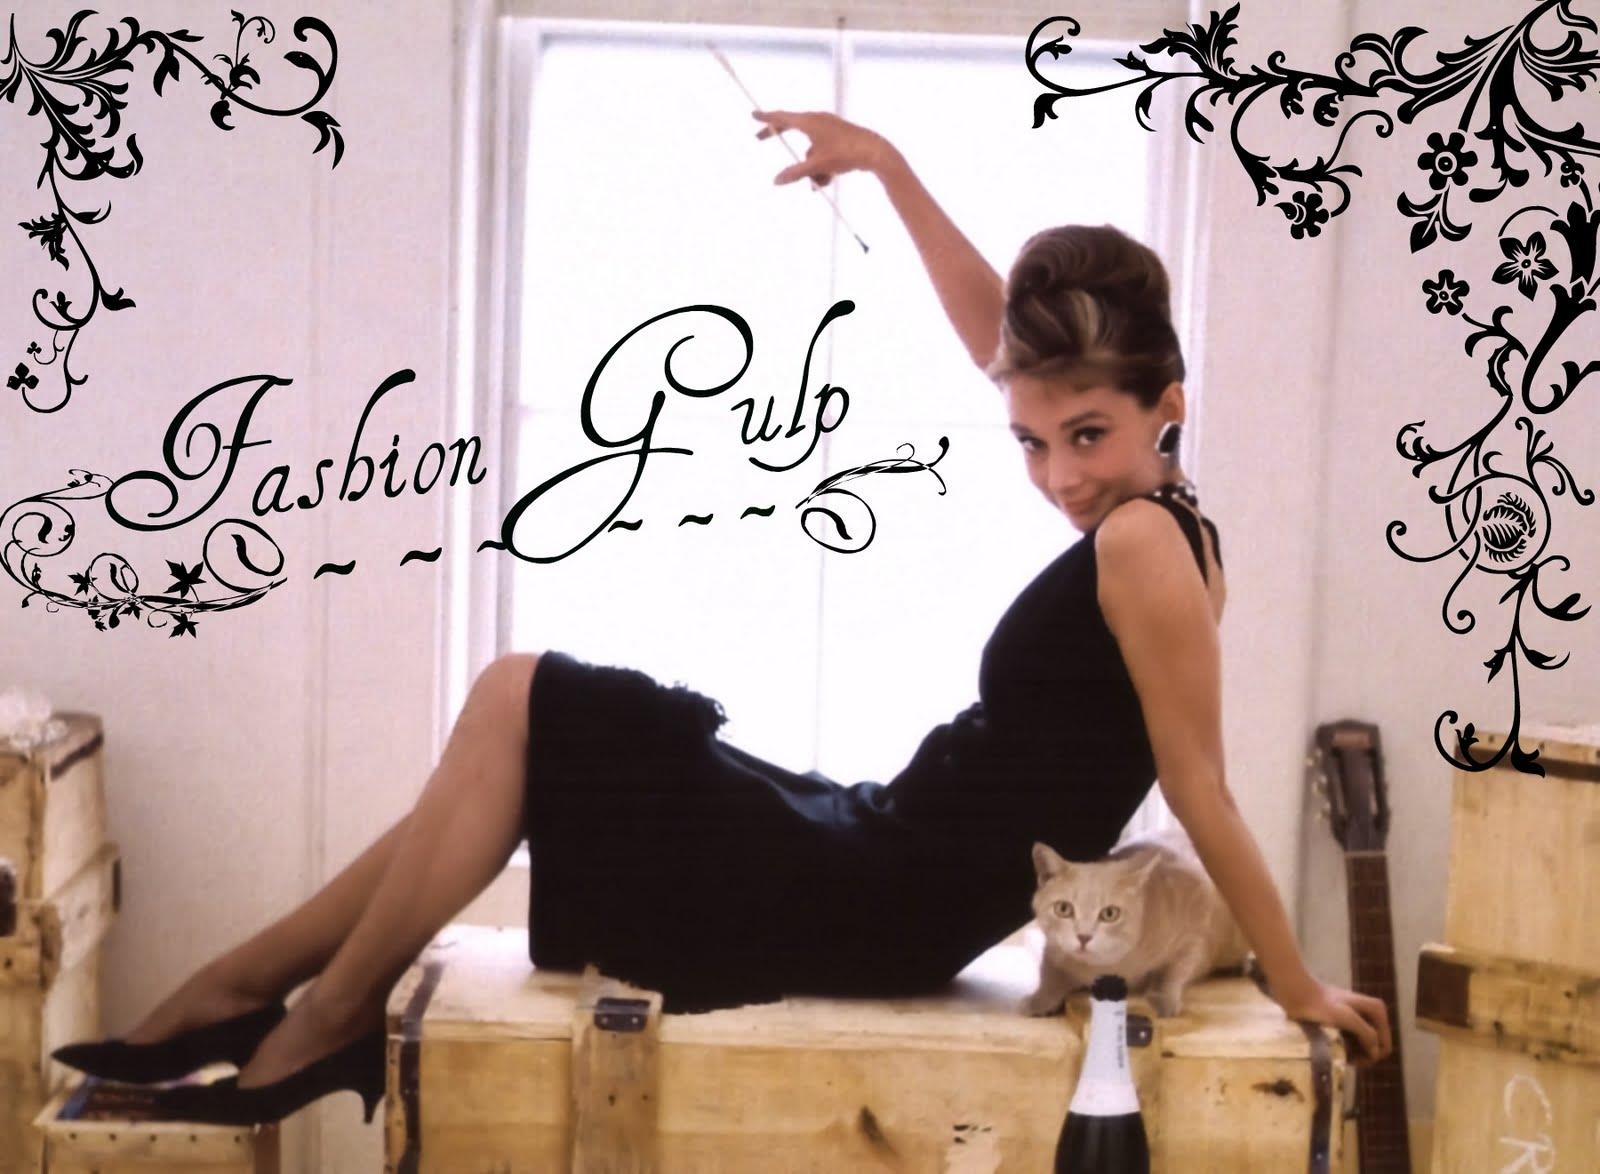 FashionGulp